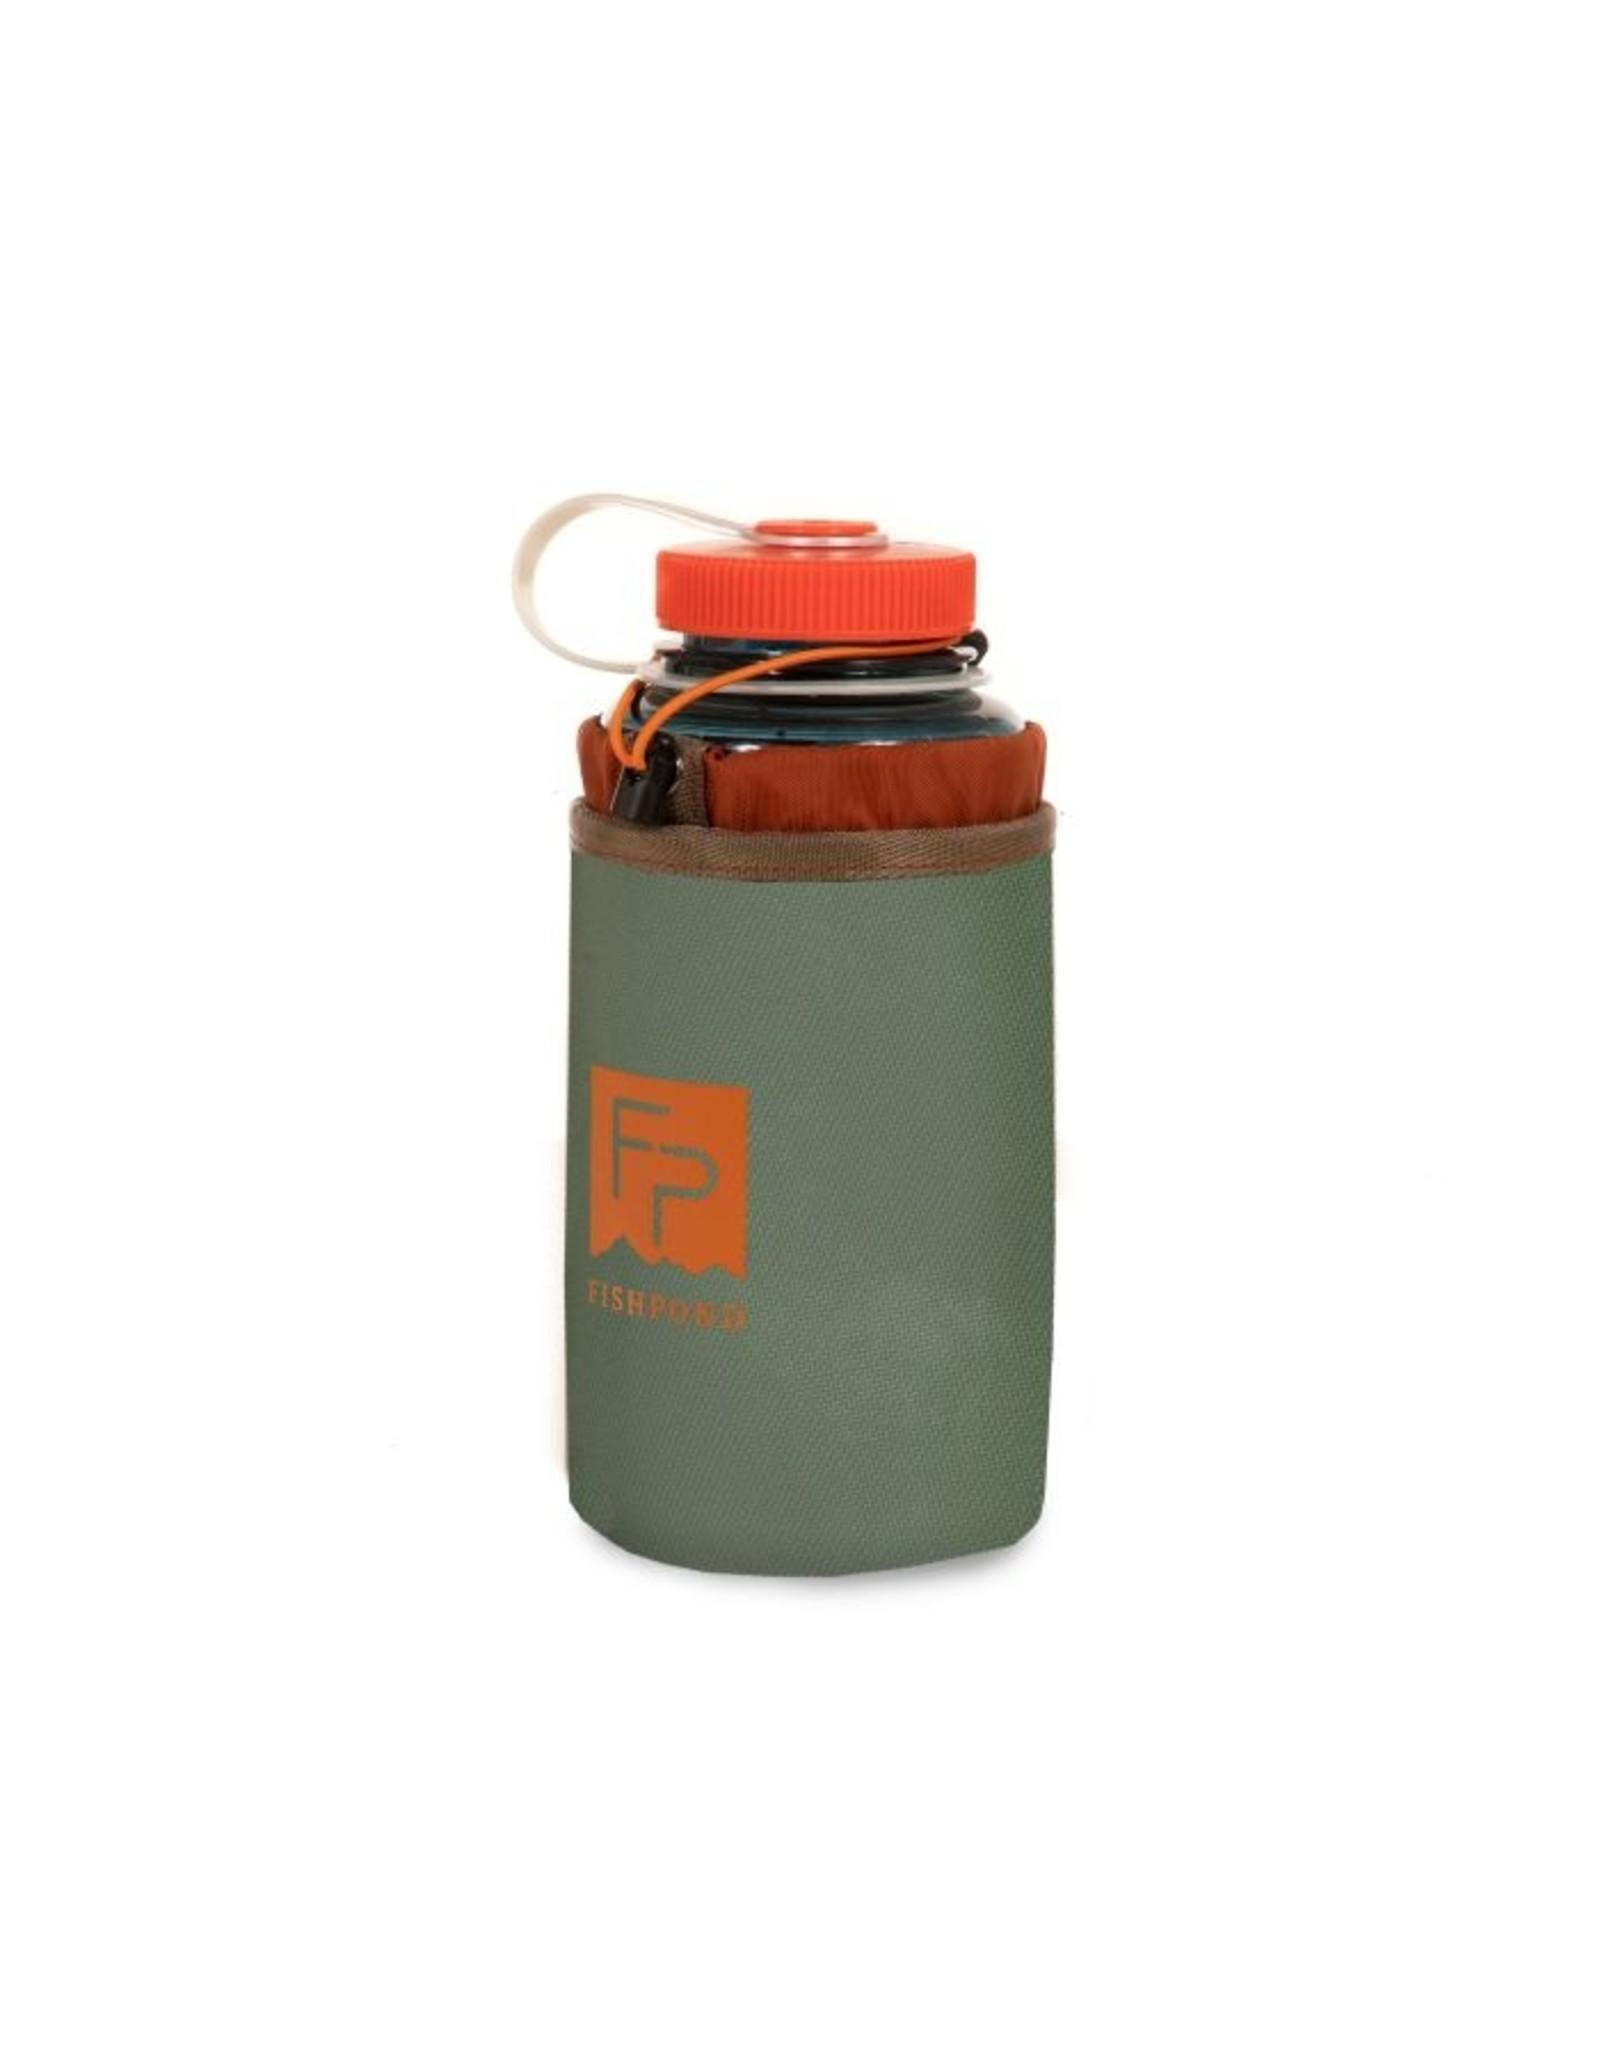 Fishpond Thunderhead Water Bottle Holder - Yucca